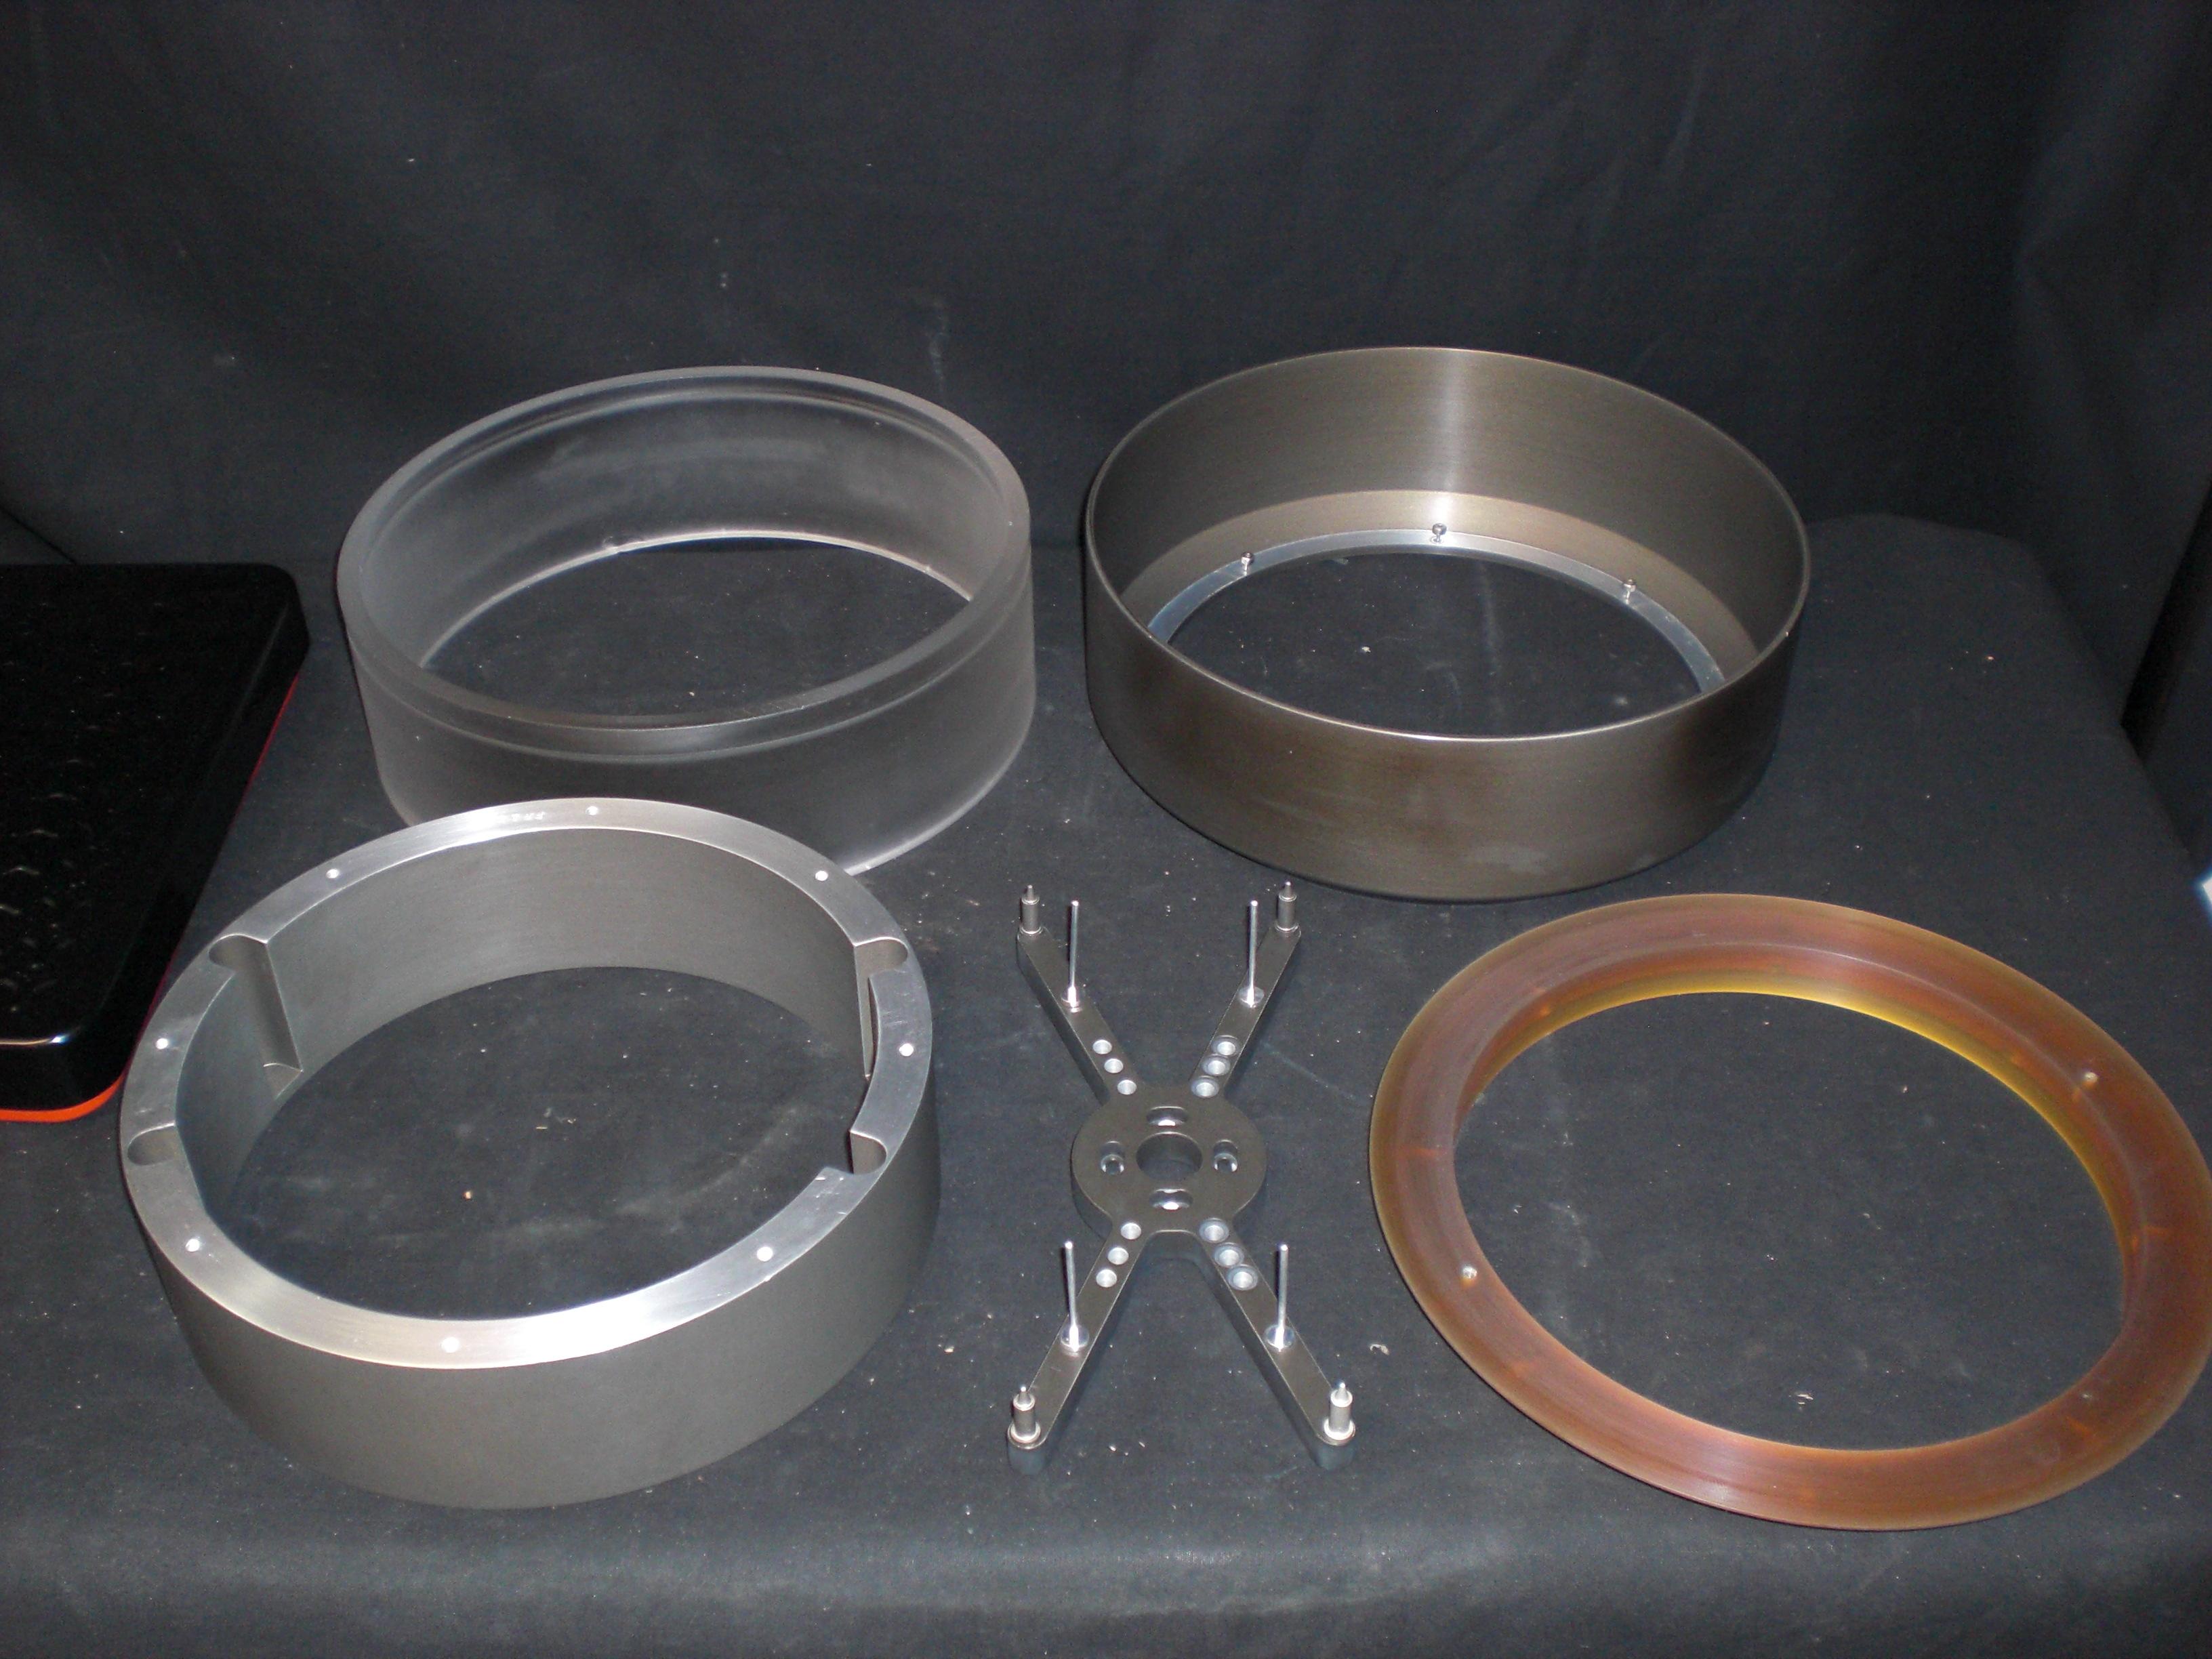 Kit AMAT P-5000 200mm Wafer LIFT ASSY Process 200MM PRODUCER Cathode